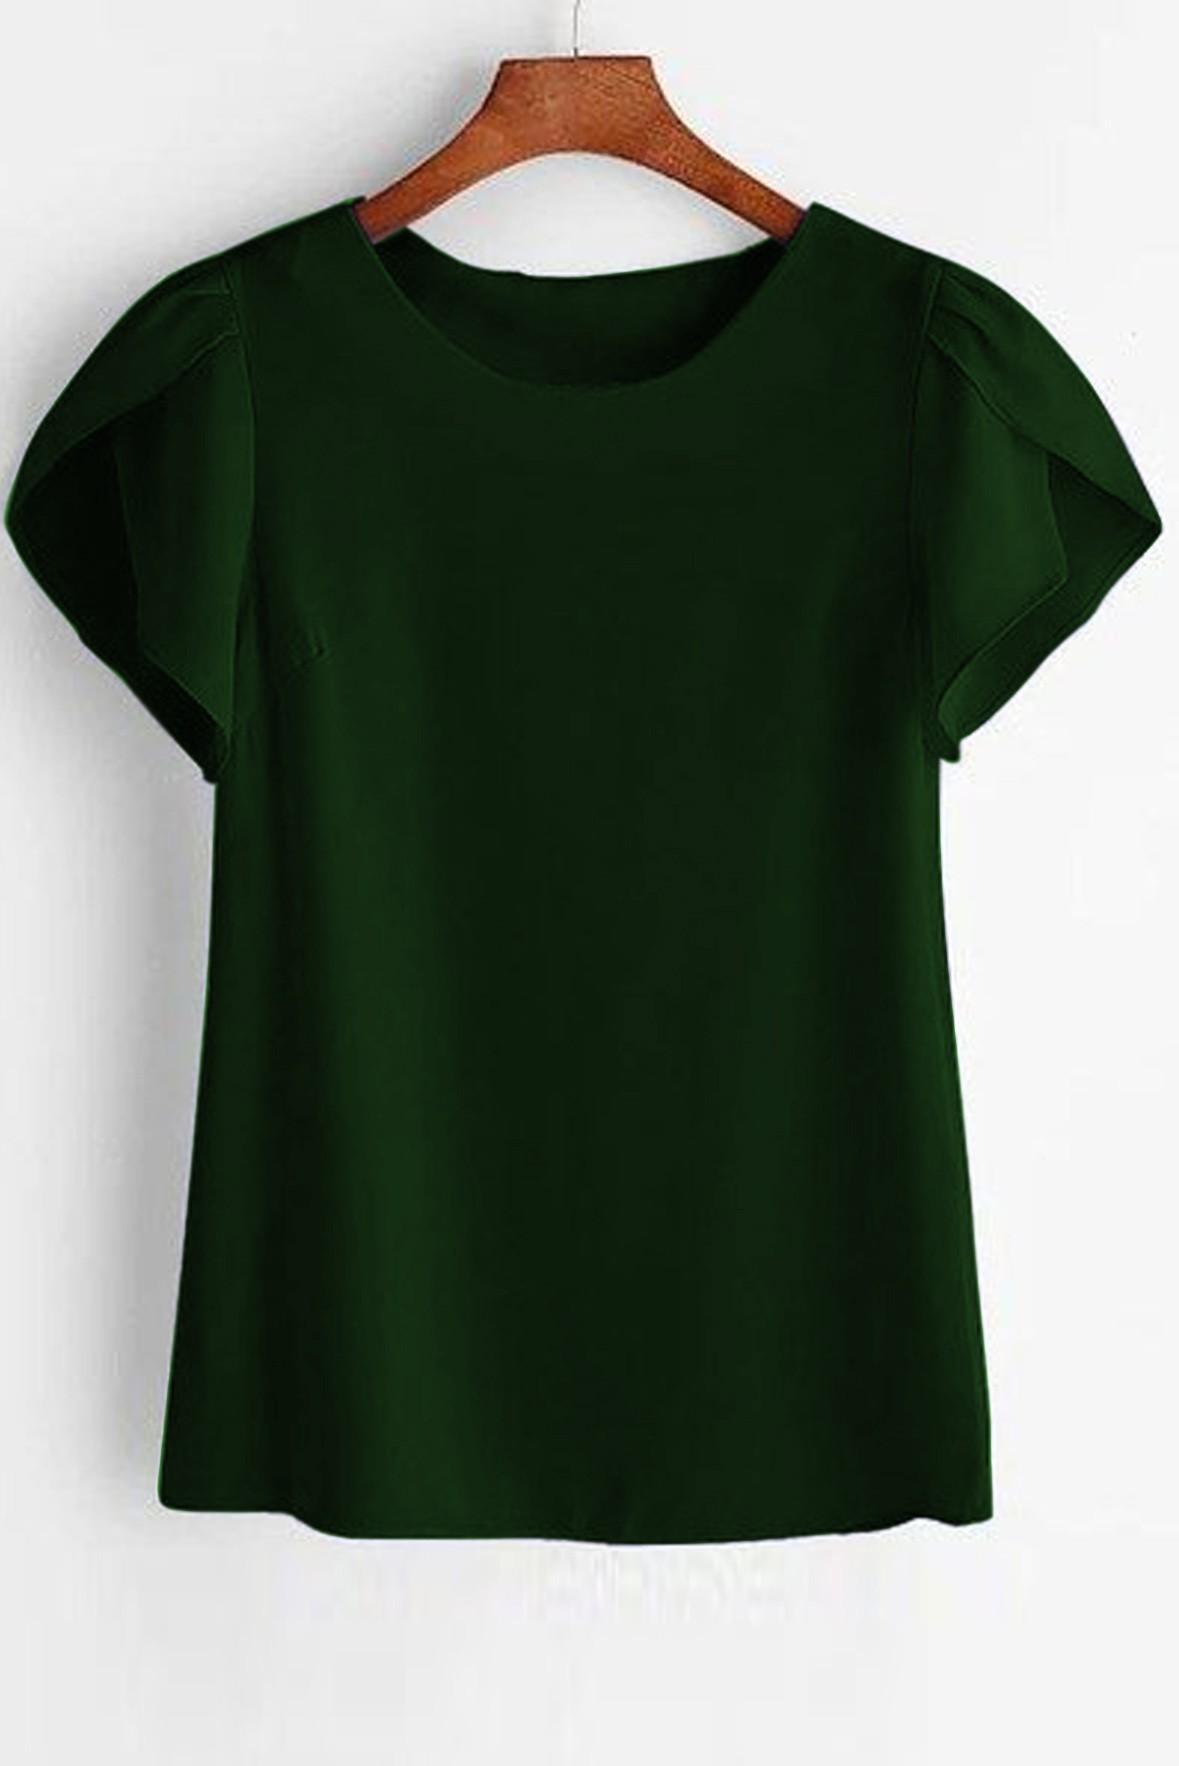 Petal Sleeve Solid Green Top